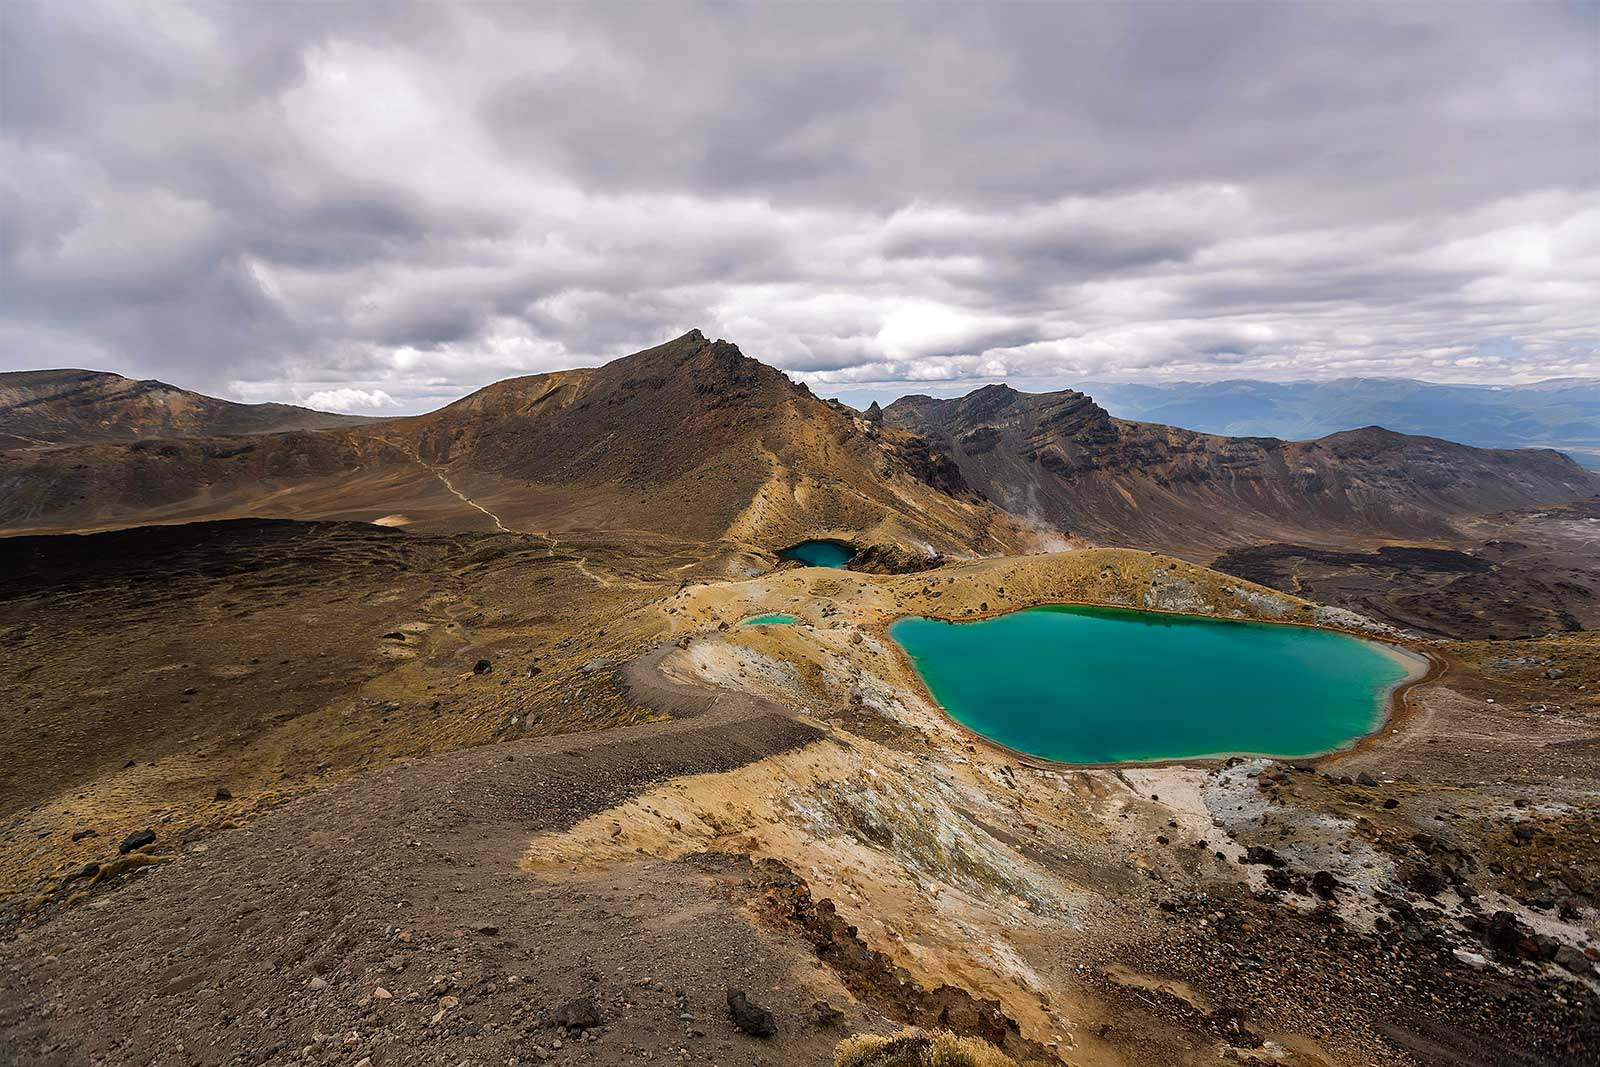 tongariro-alpine-crossing-emeral-lakes-new-zealand-1